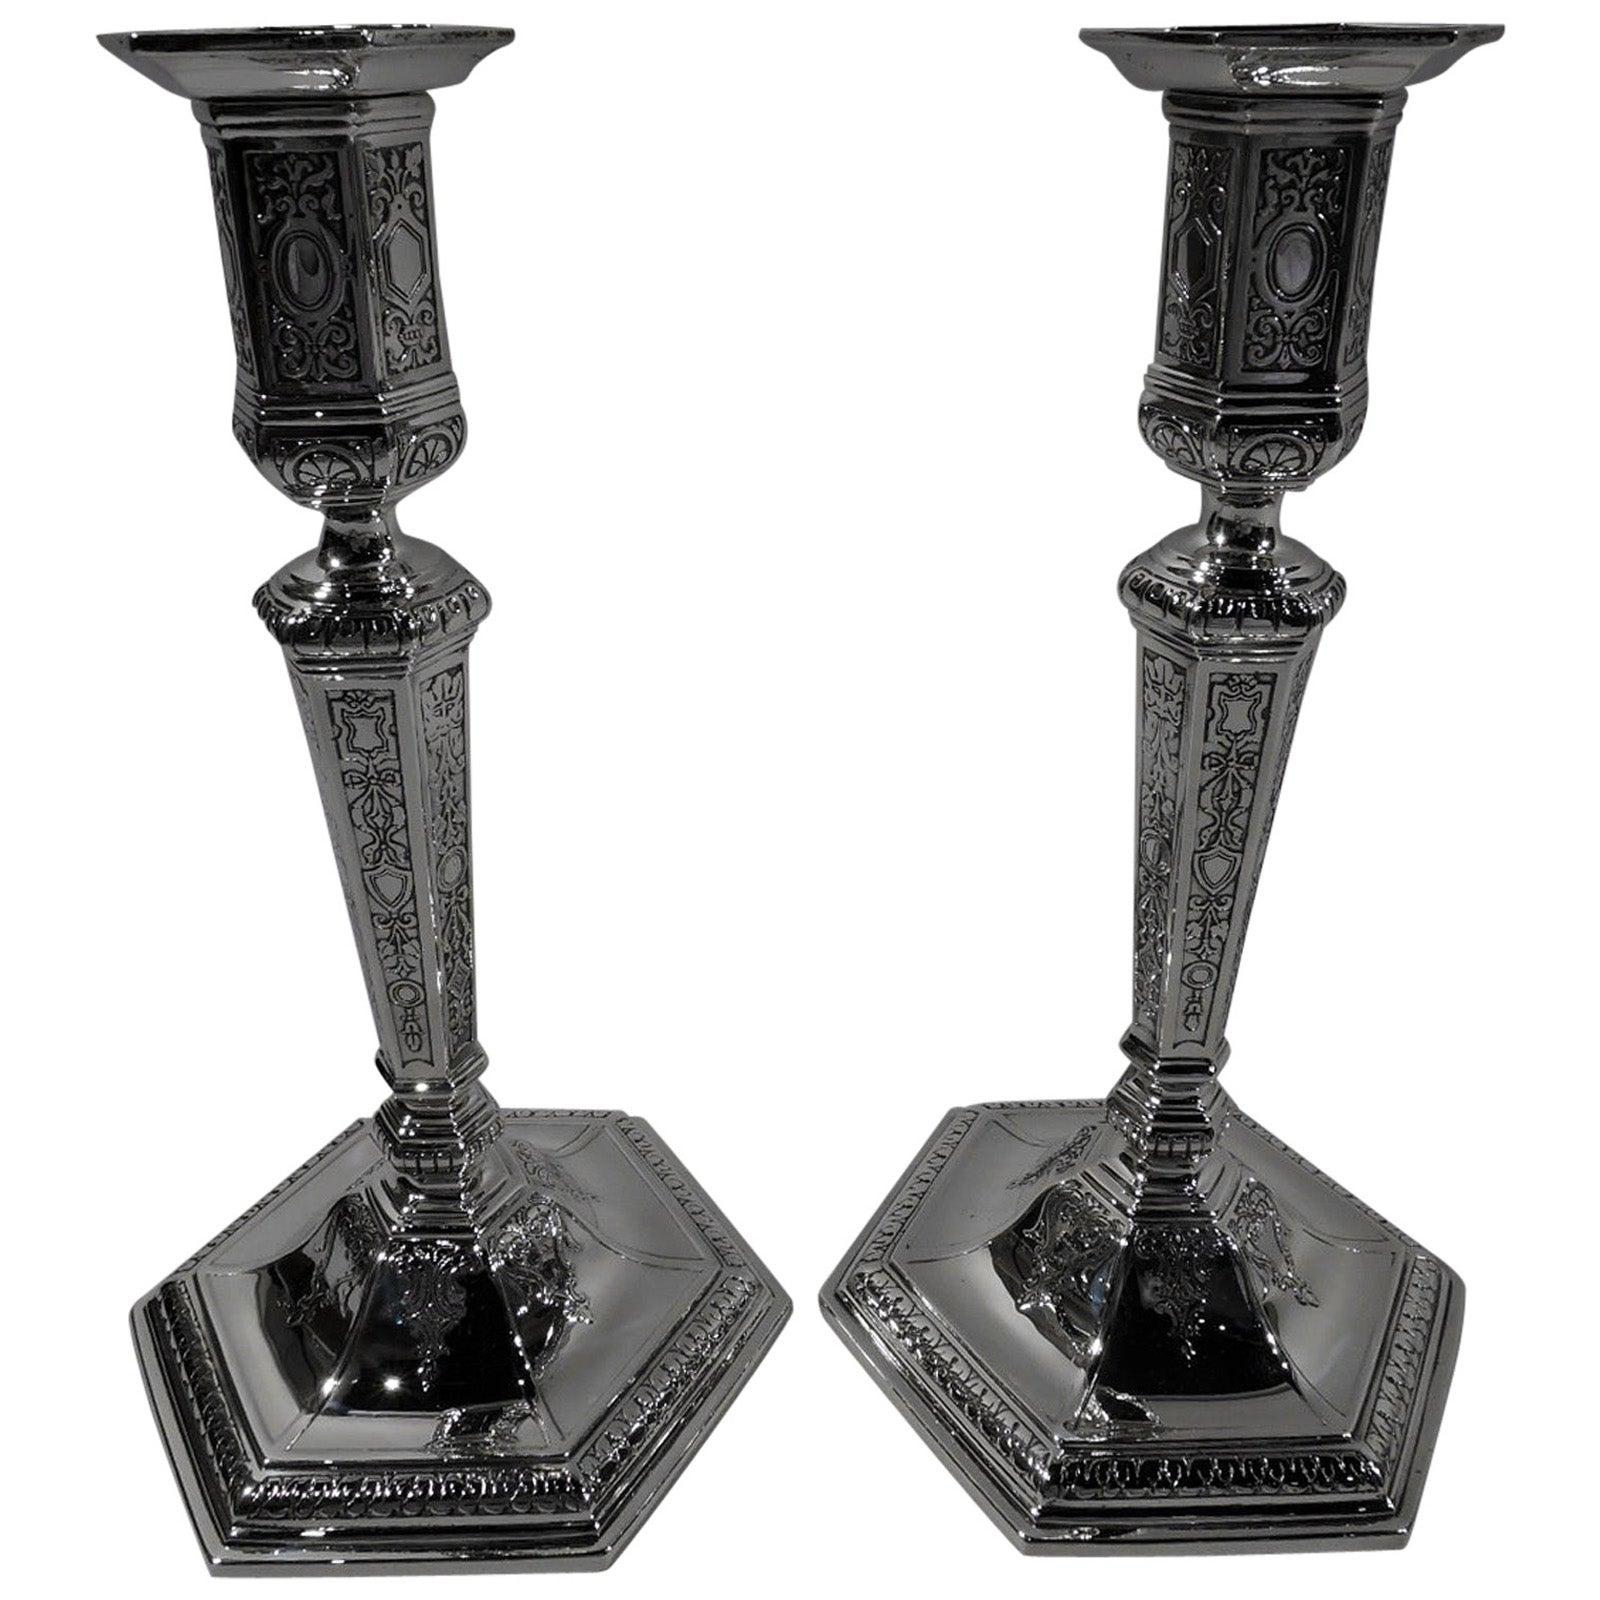 Pair of Tiffany Edwardian Regency Sterling Silver Candlesticks